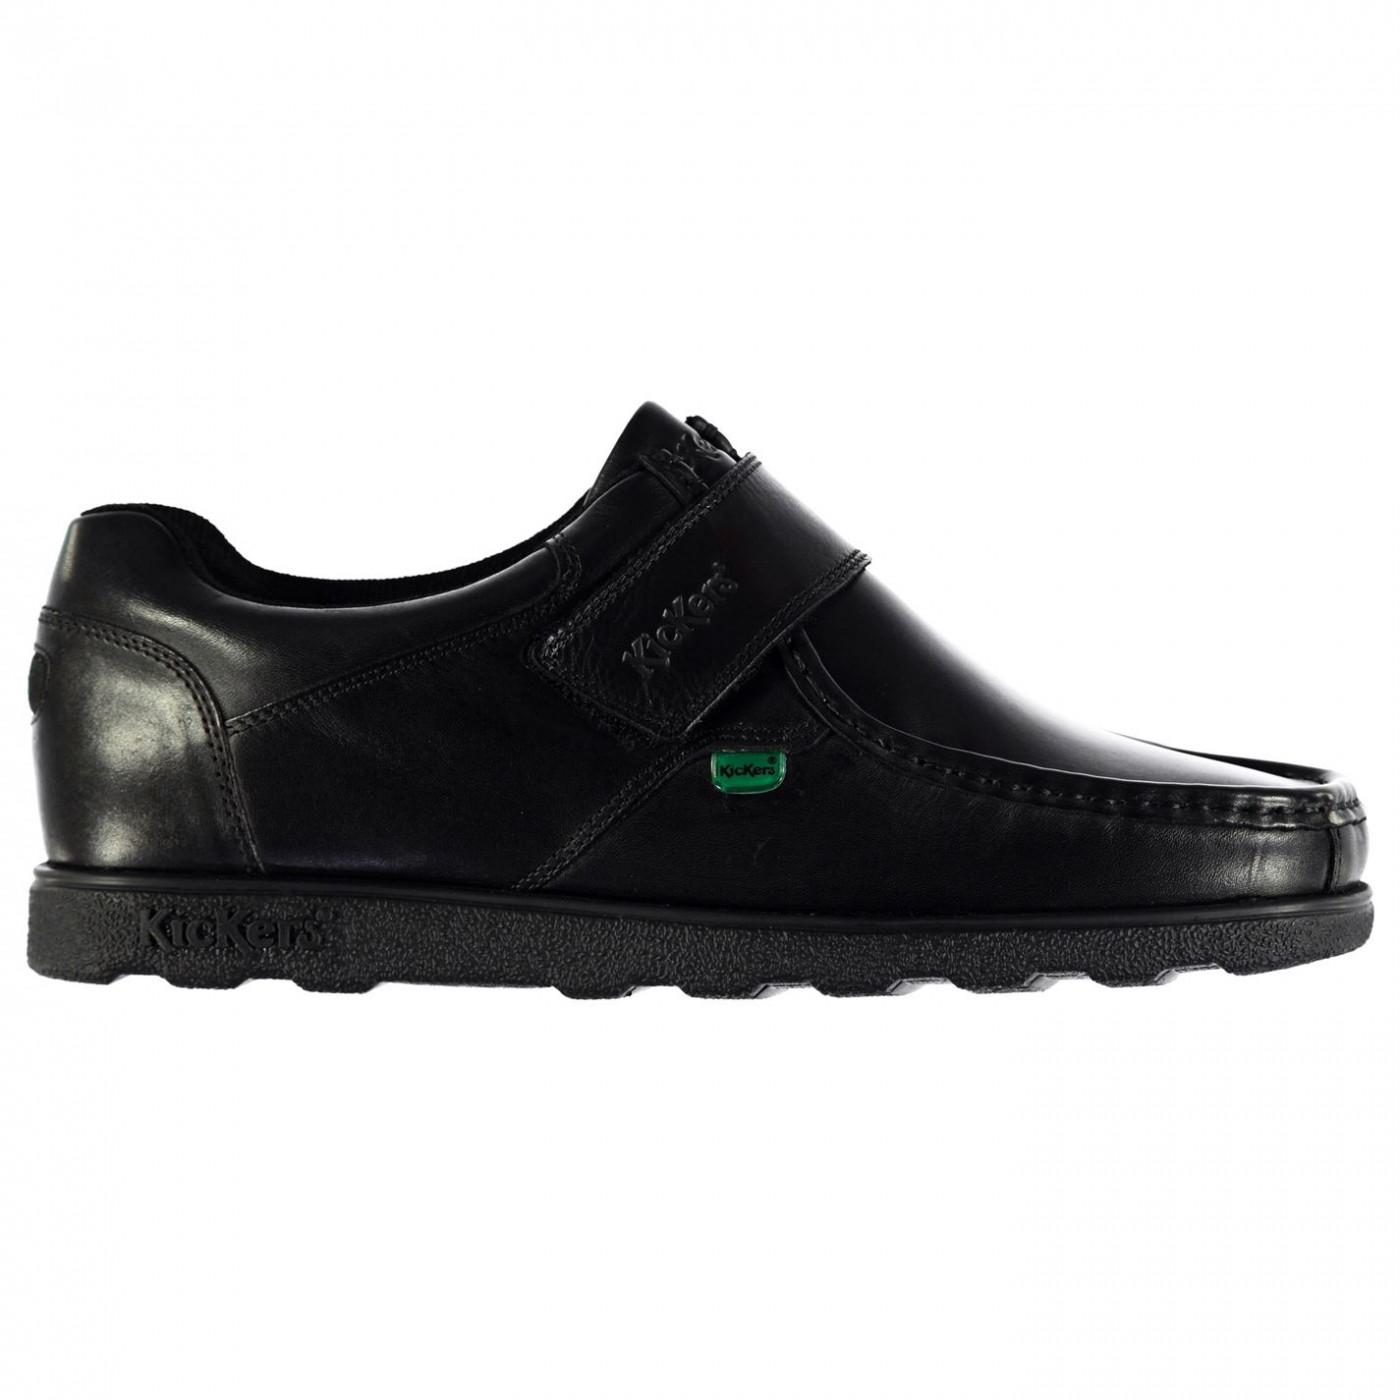 Kickers Fragma Mens Shoes